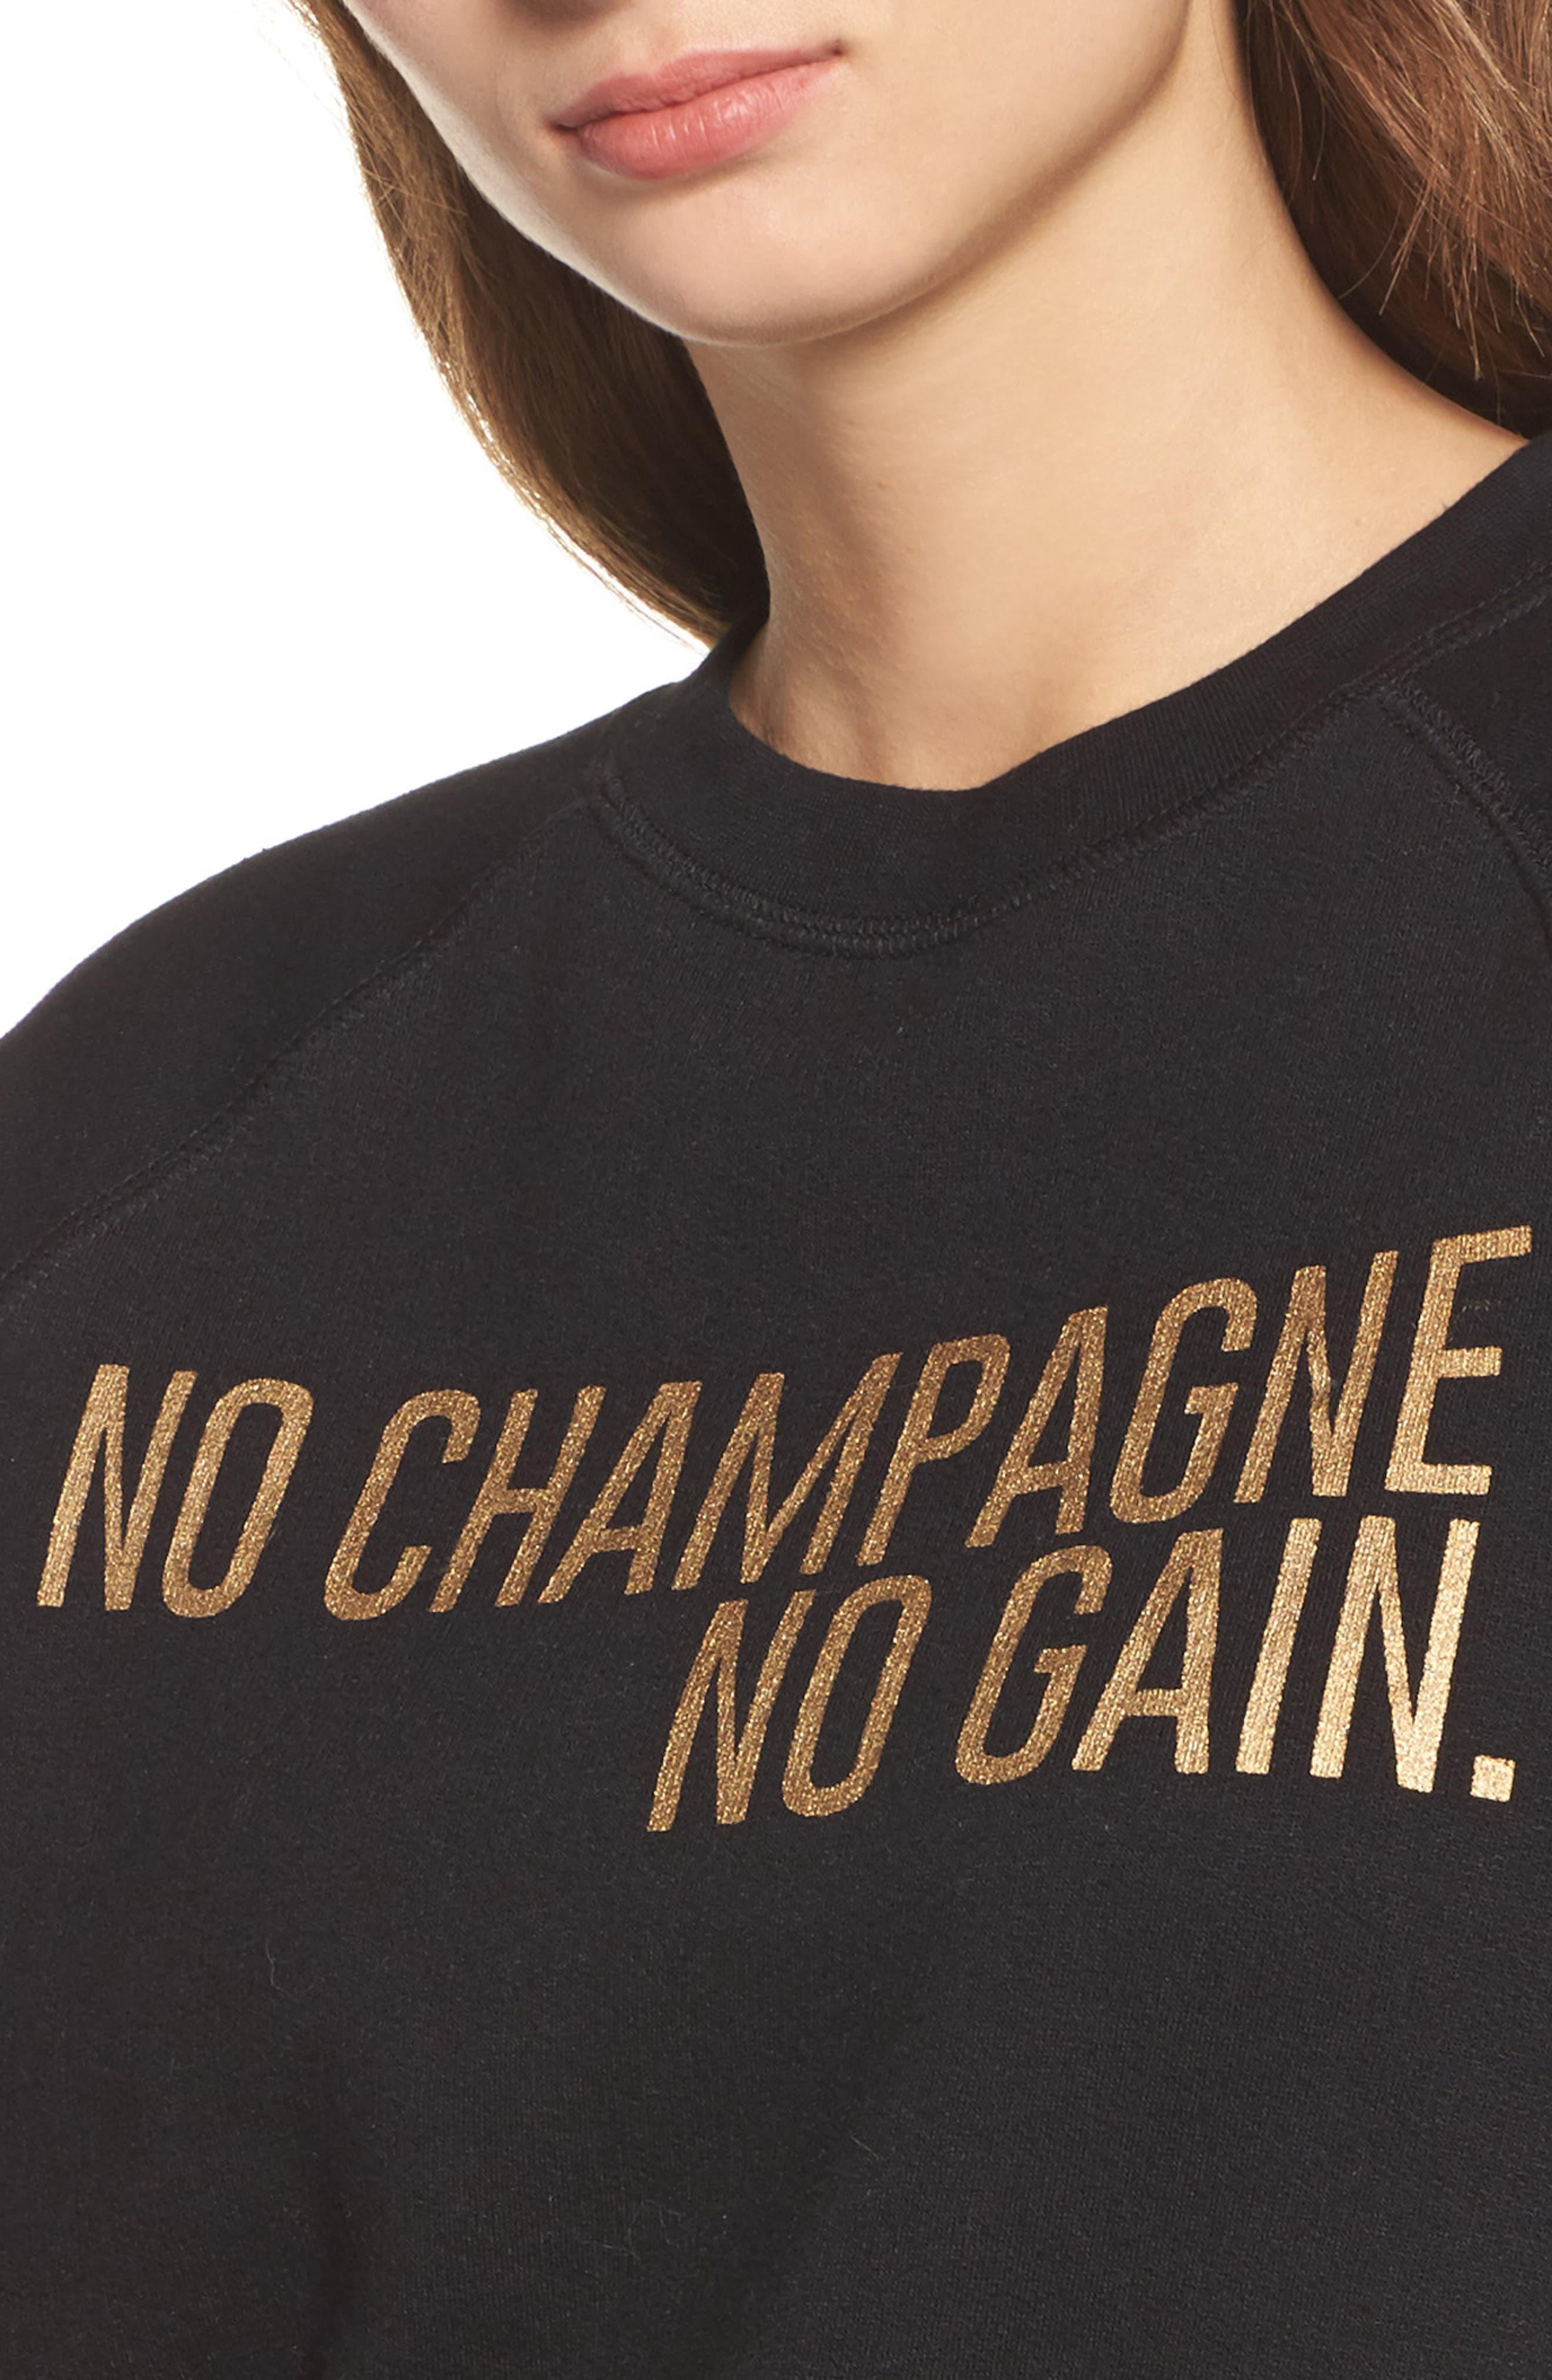 No Champagne No Gain Sweatshirt,                             Alternate thumbnail 4, color,                             001